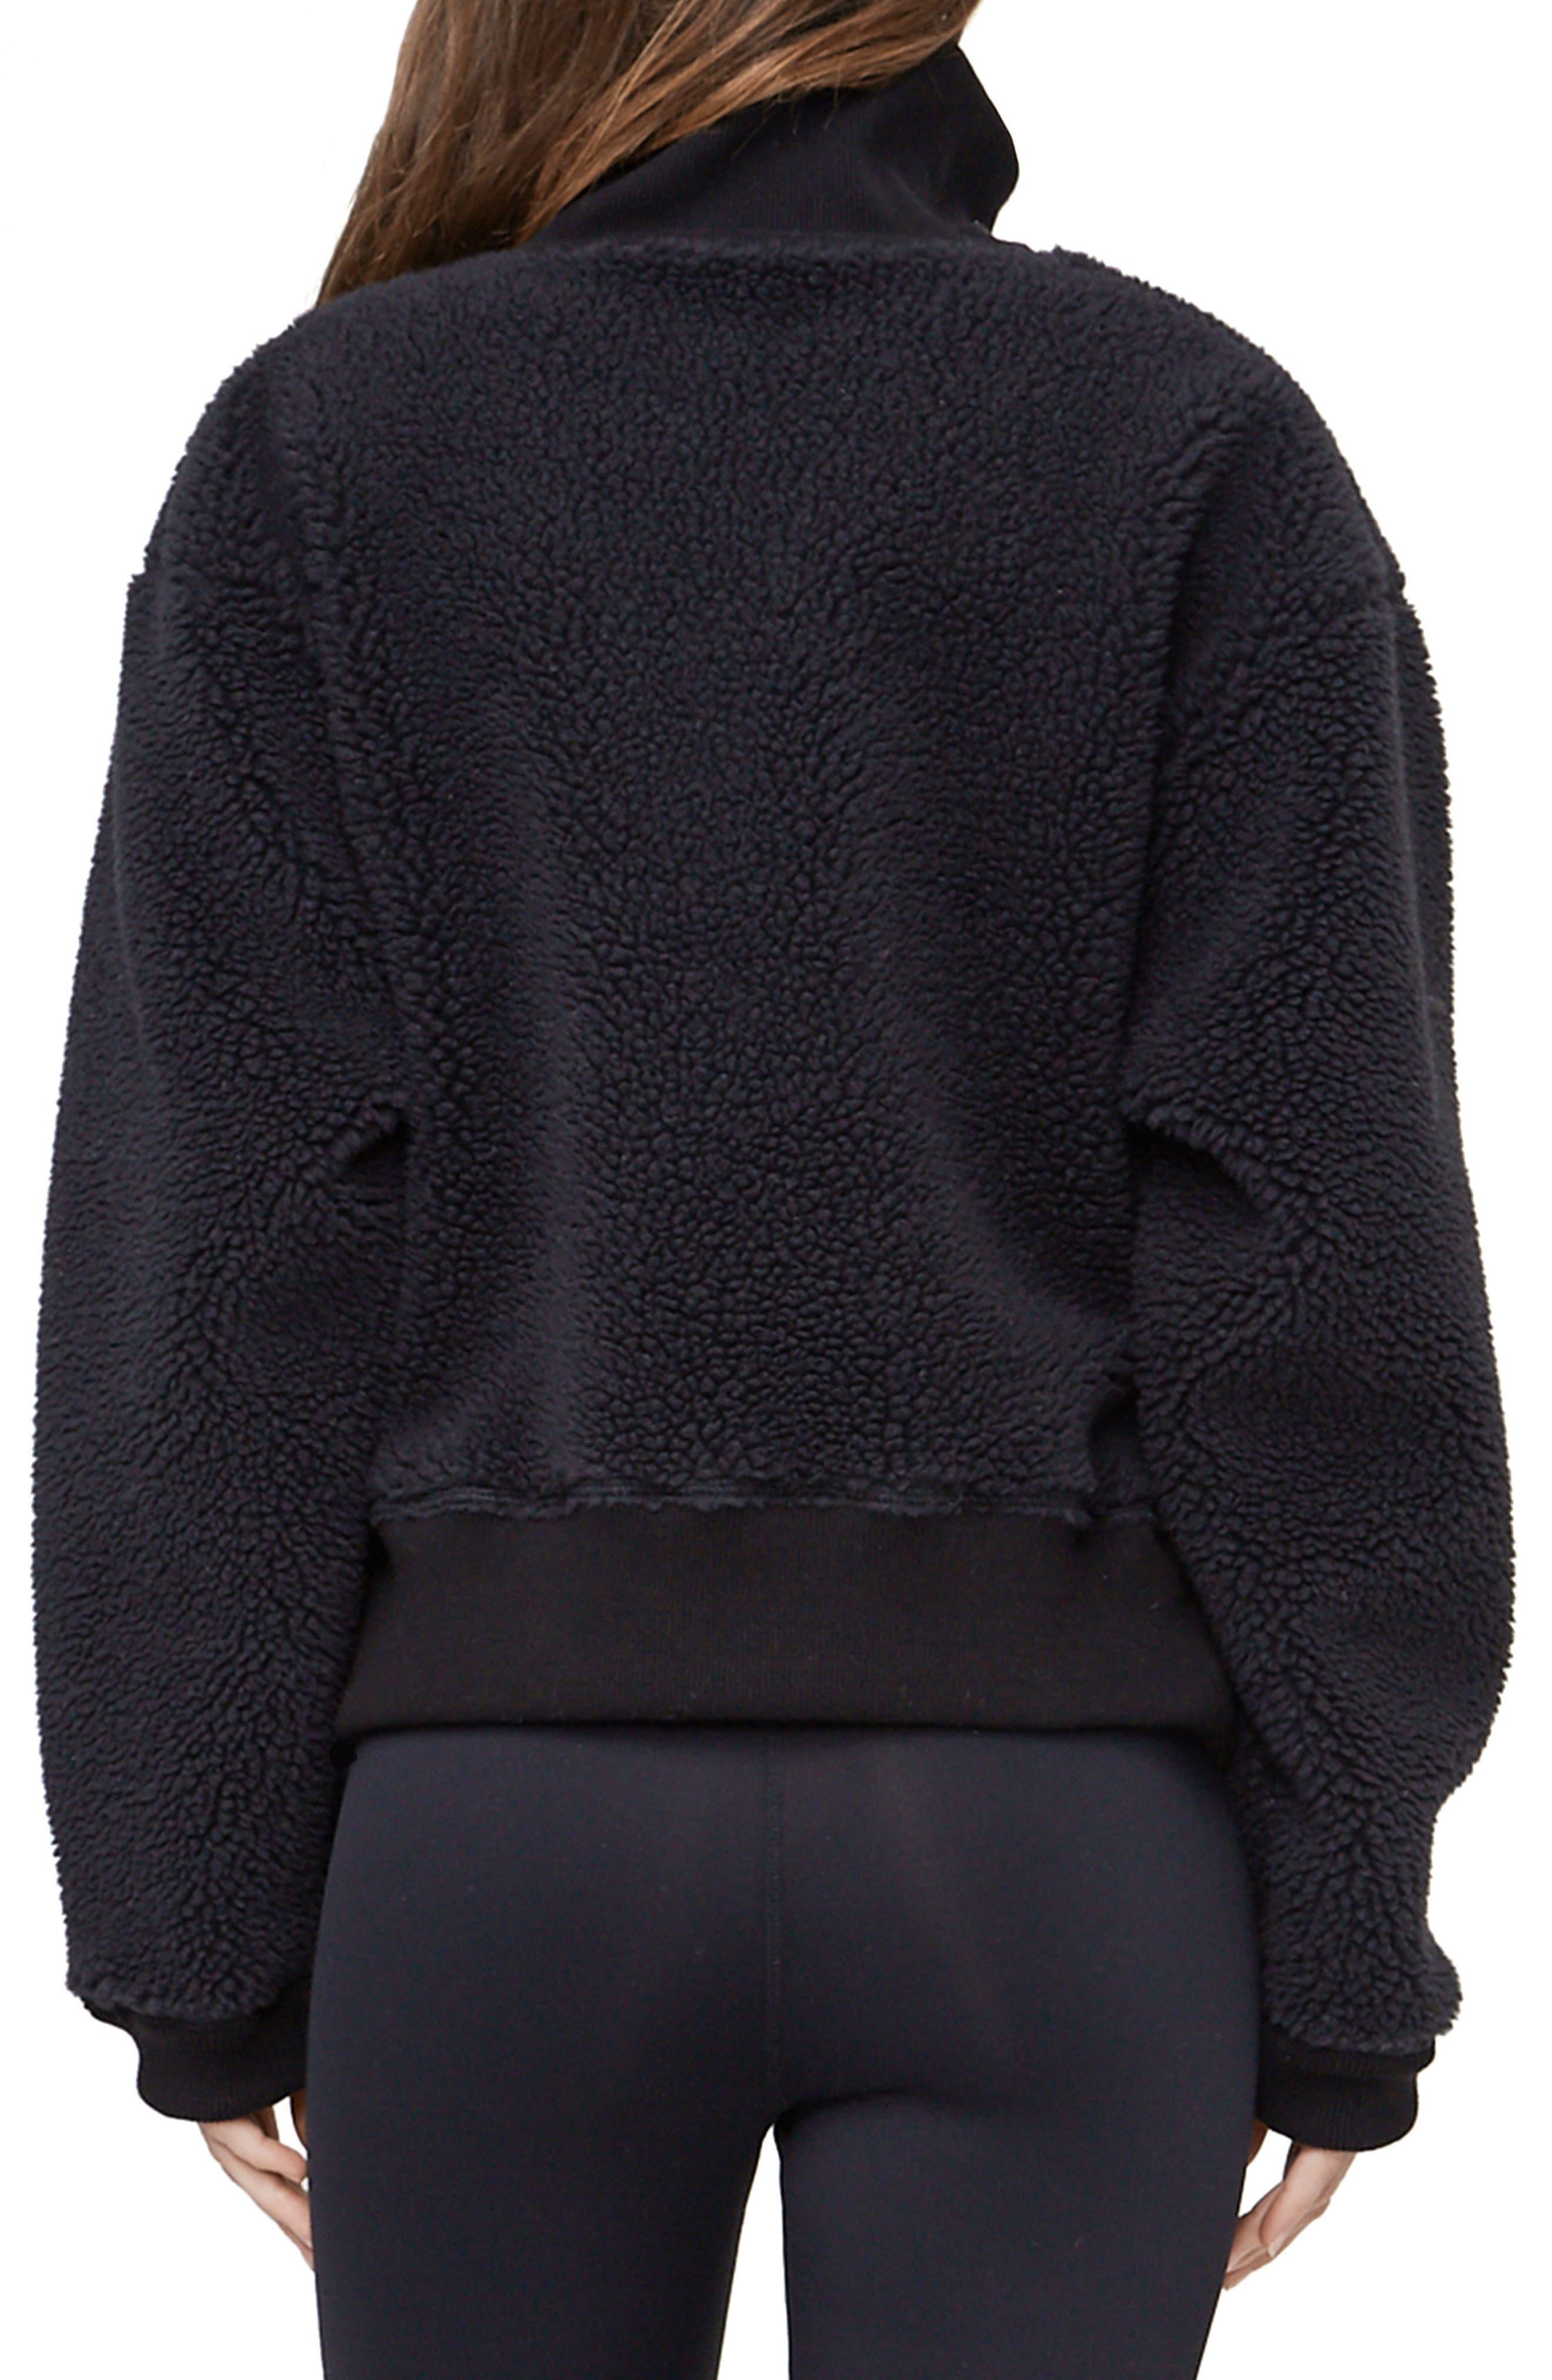 Daphne Fleece Pullover,                             Alternate thumbnail 2, color,                             Black